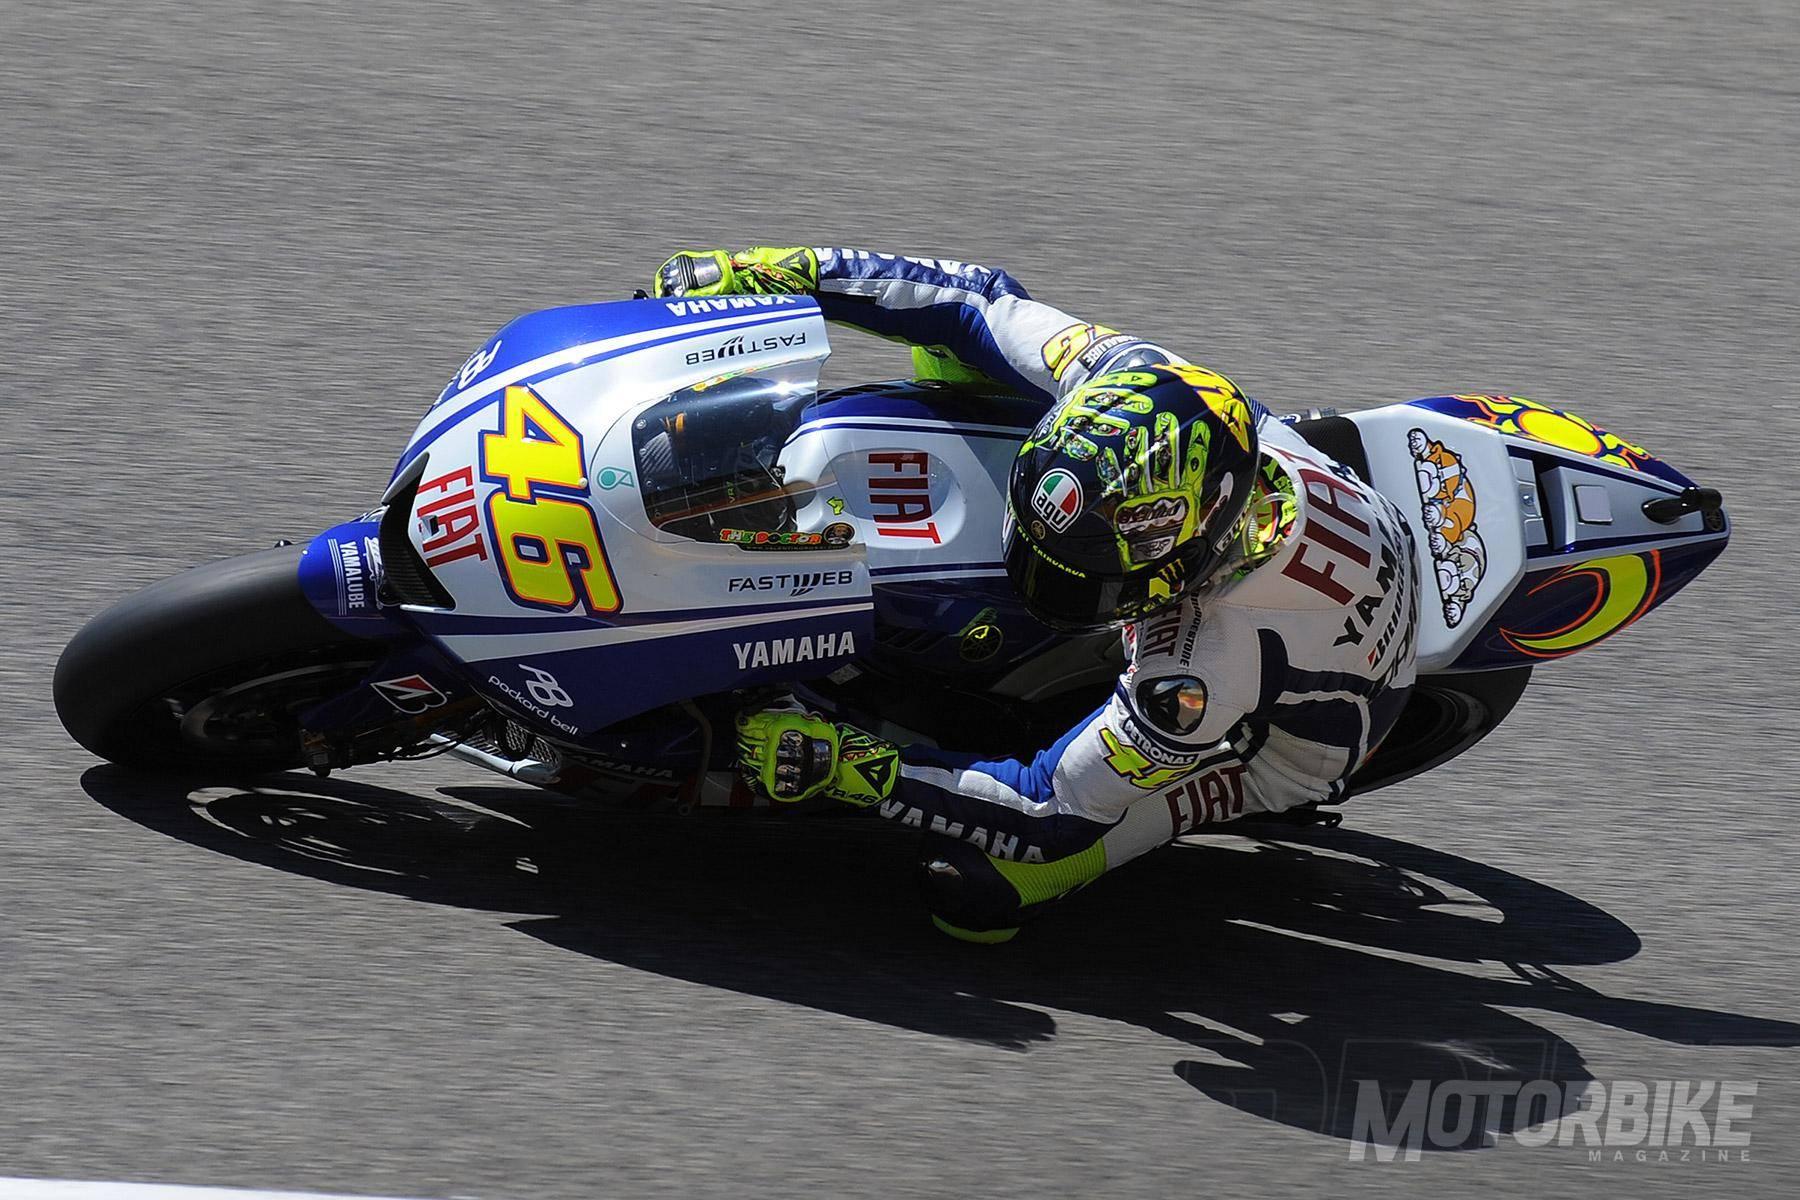 Cascos Valentino Rossi - Mugello - GP de Italia - Motorbike Magazine